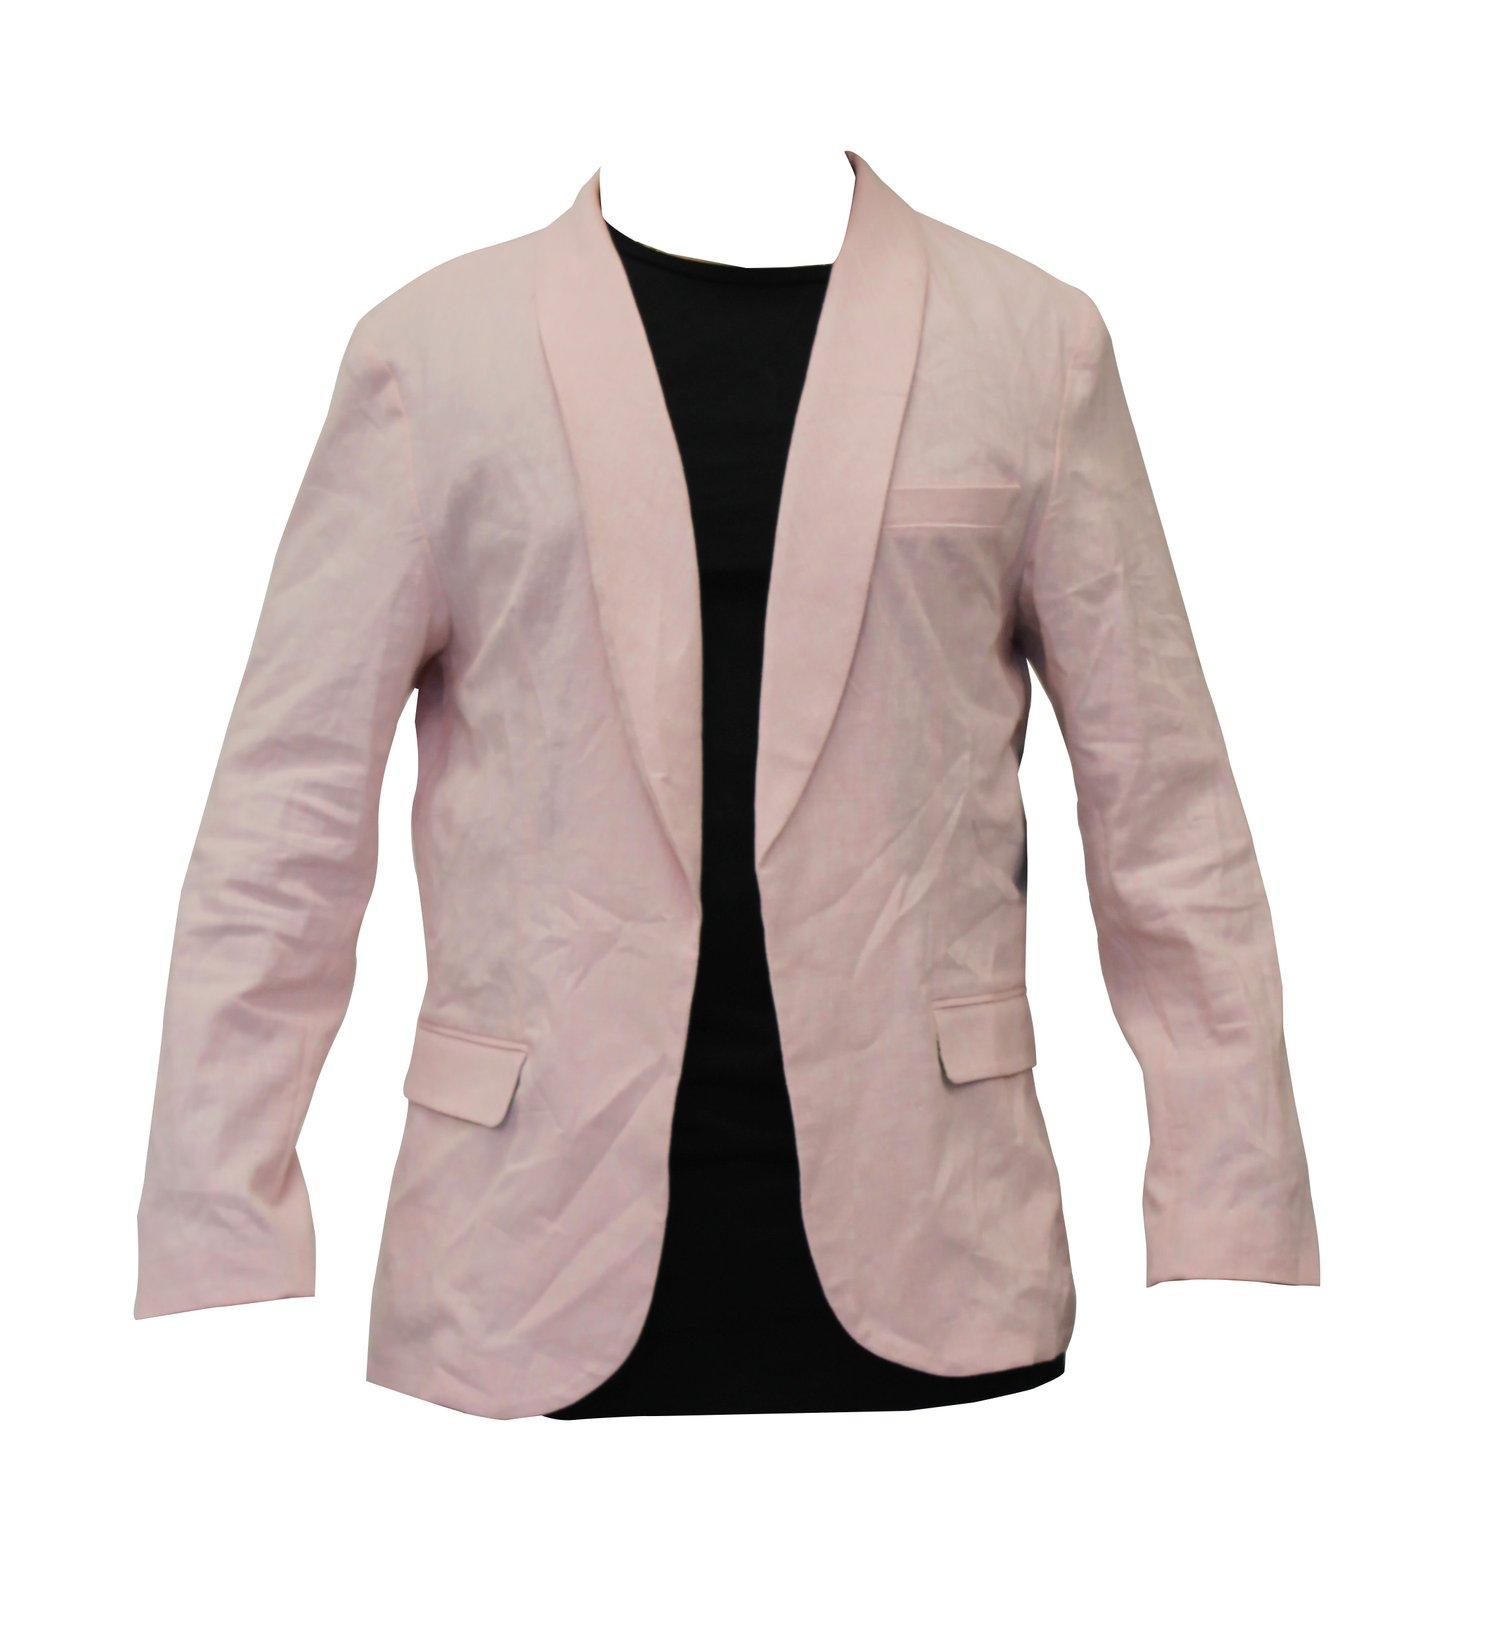 Image of Solid Pink Linen Blazer